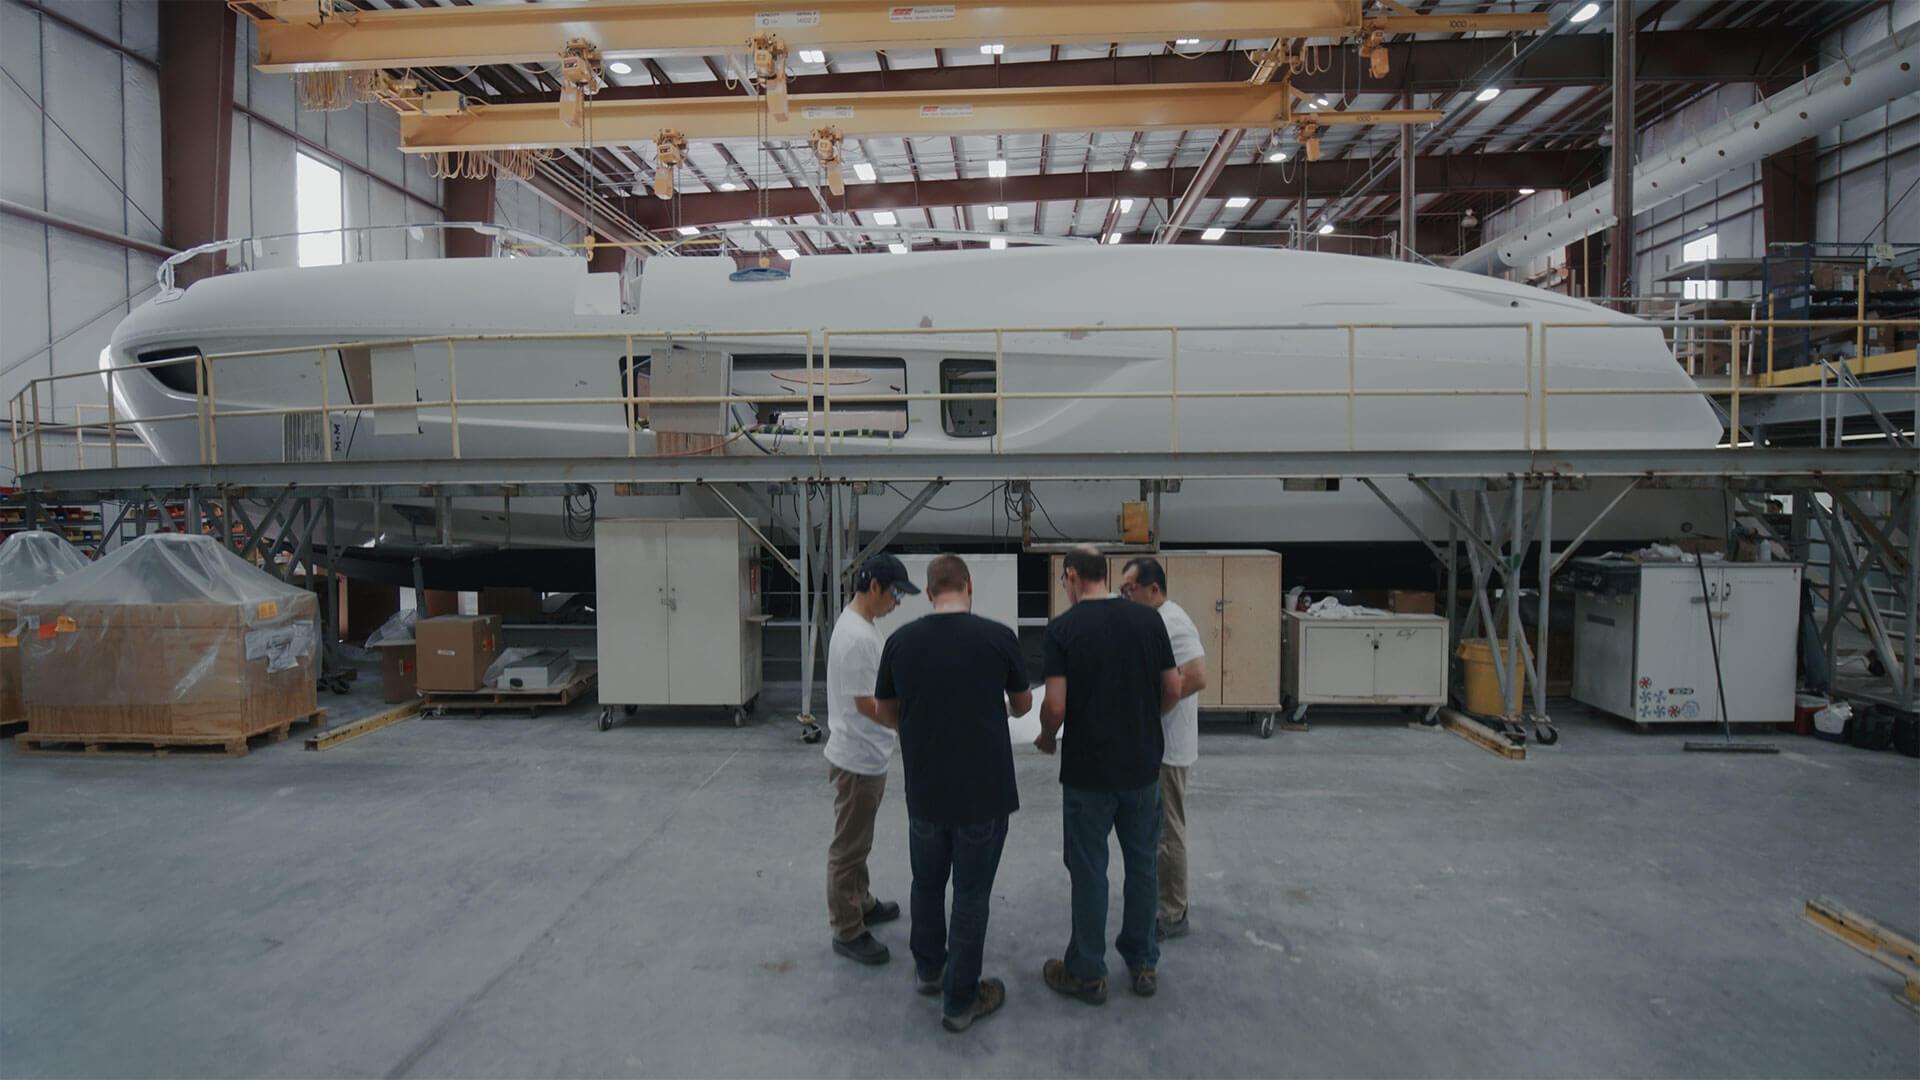 2020 lexus news yacht ly 650 gallery 08